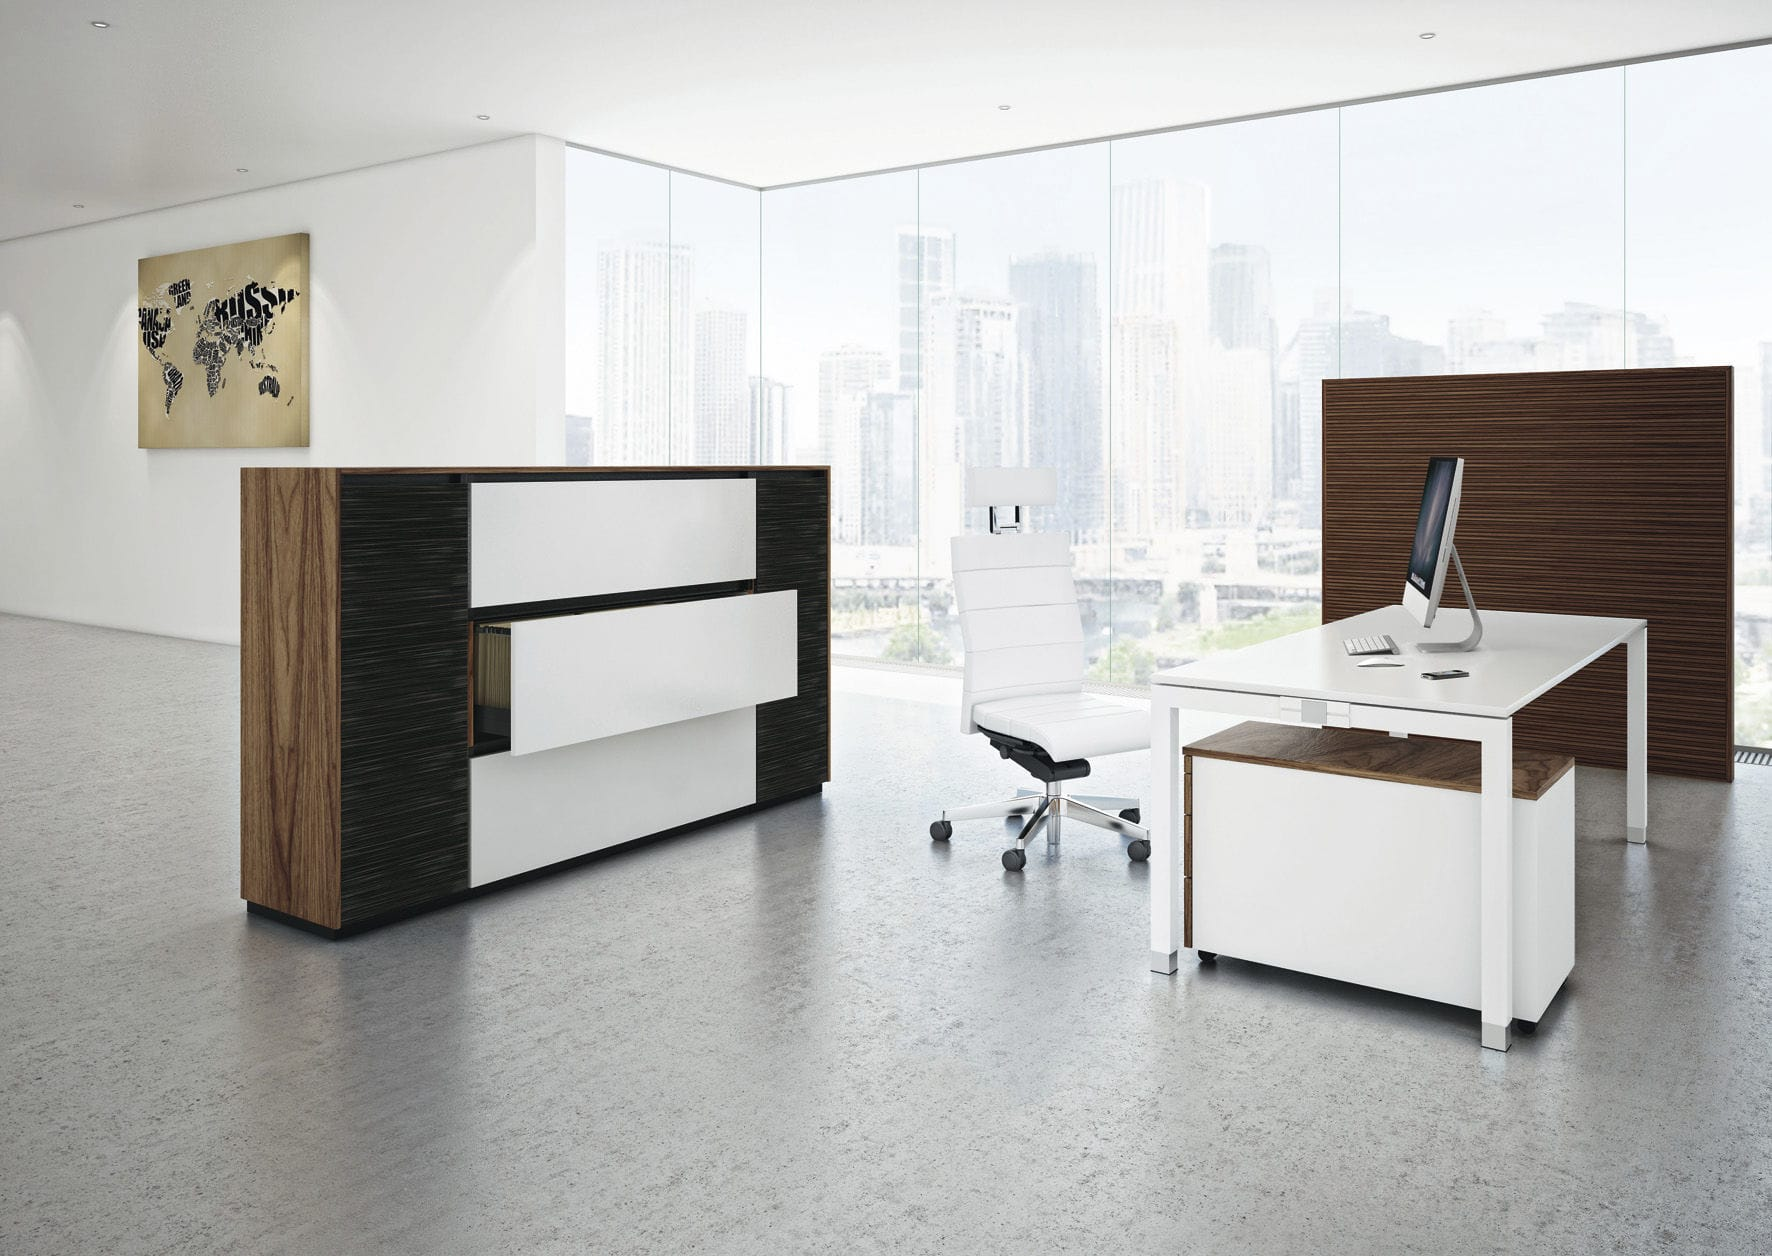 Modul-Bibliothek / modern / für Büro / Holz - INTAVIS - ASSMANN ...